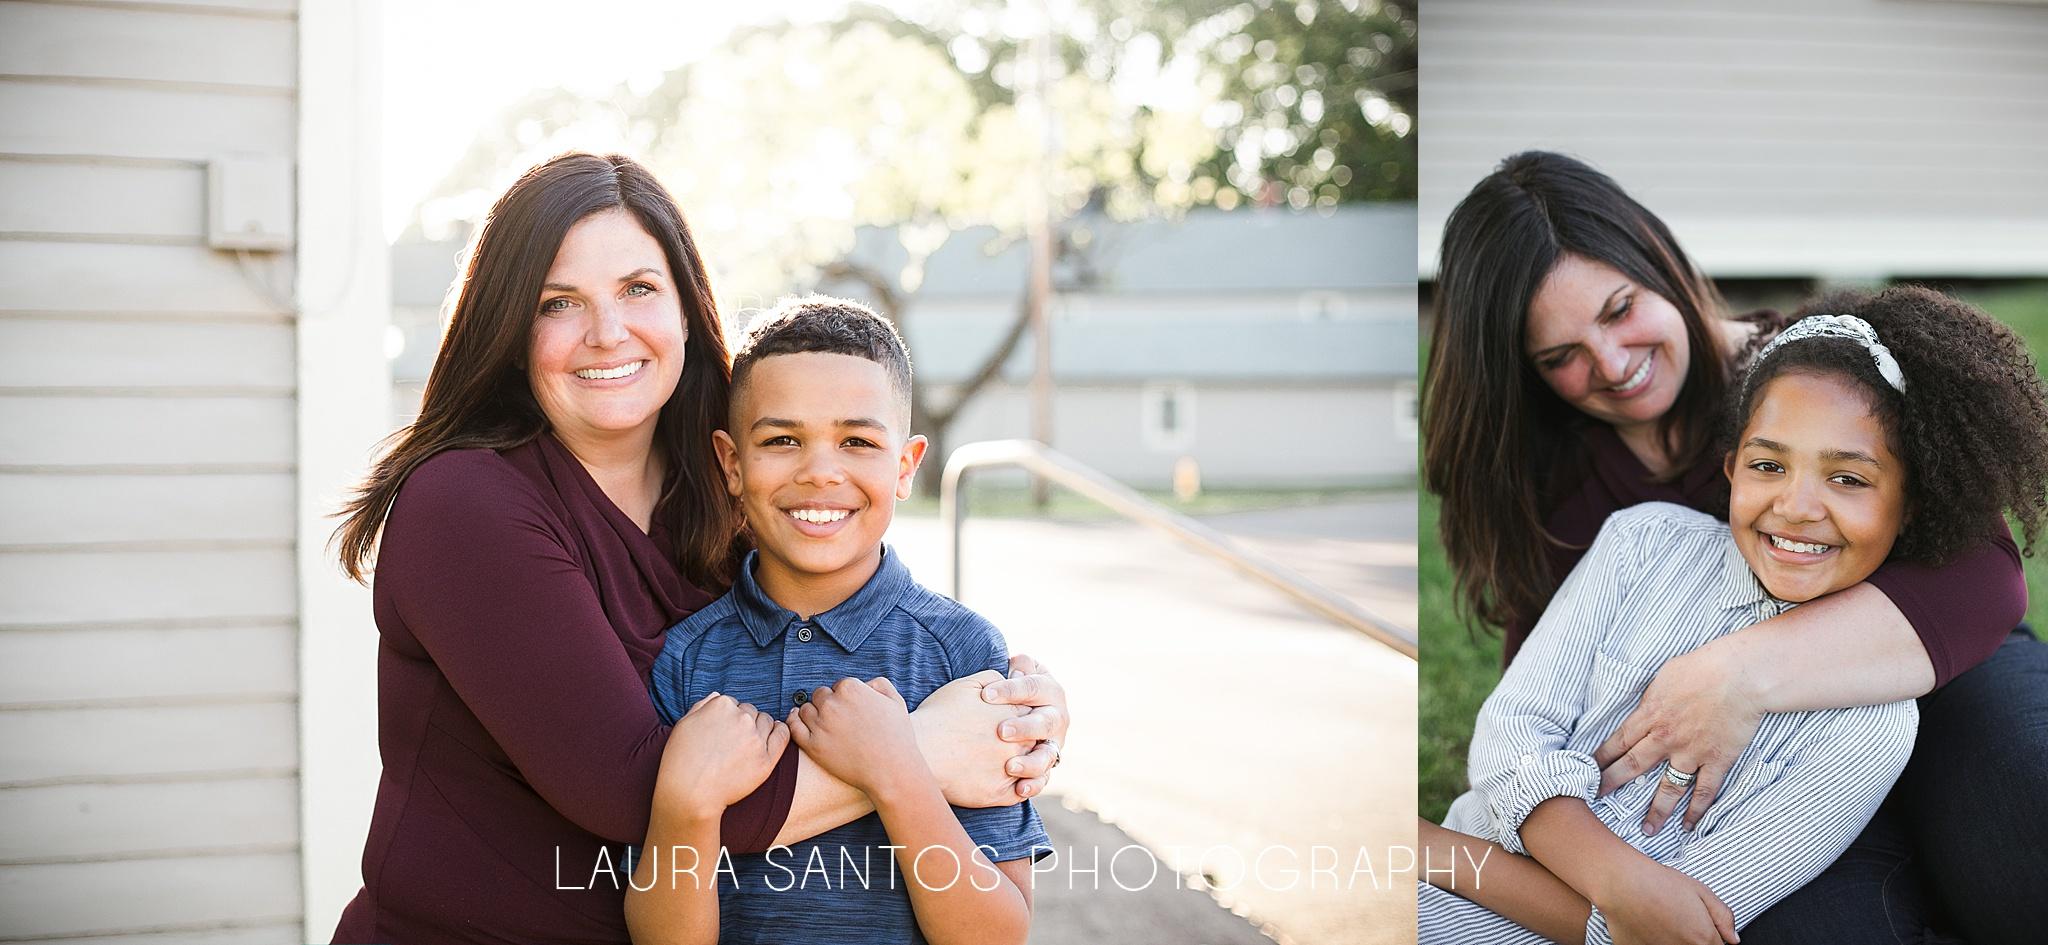 Laura Santos Photography Portland Oregon Family Photographer_0950.jpg